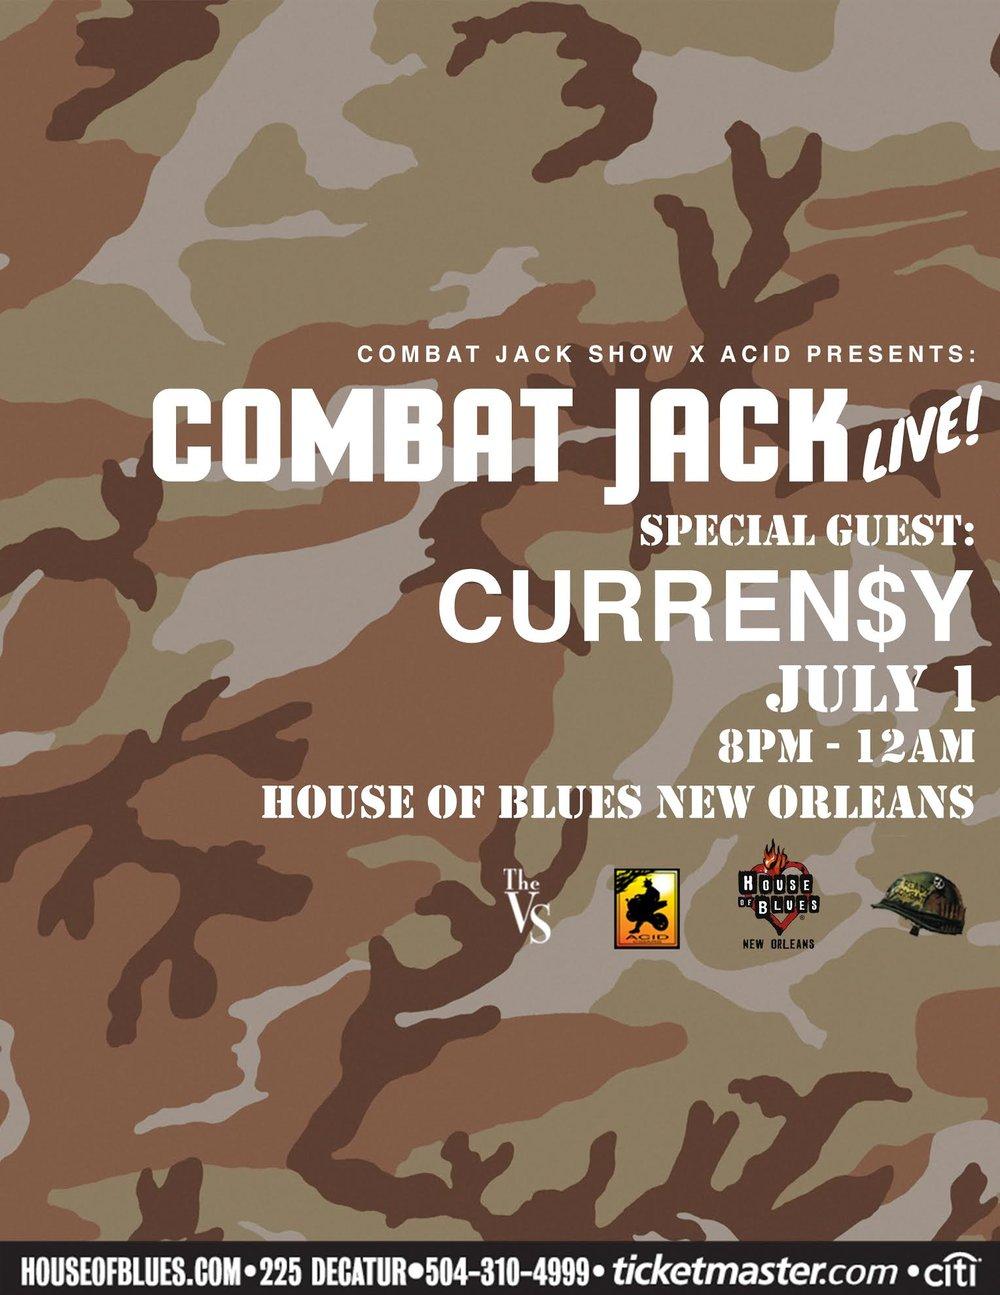 Combat_Currensy_Nola.JPG